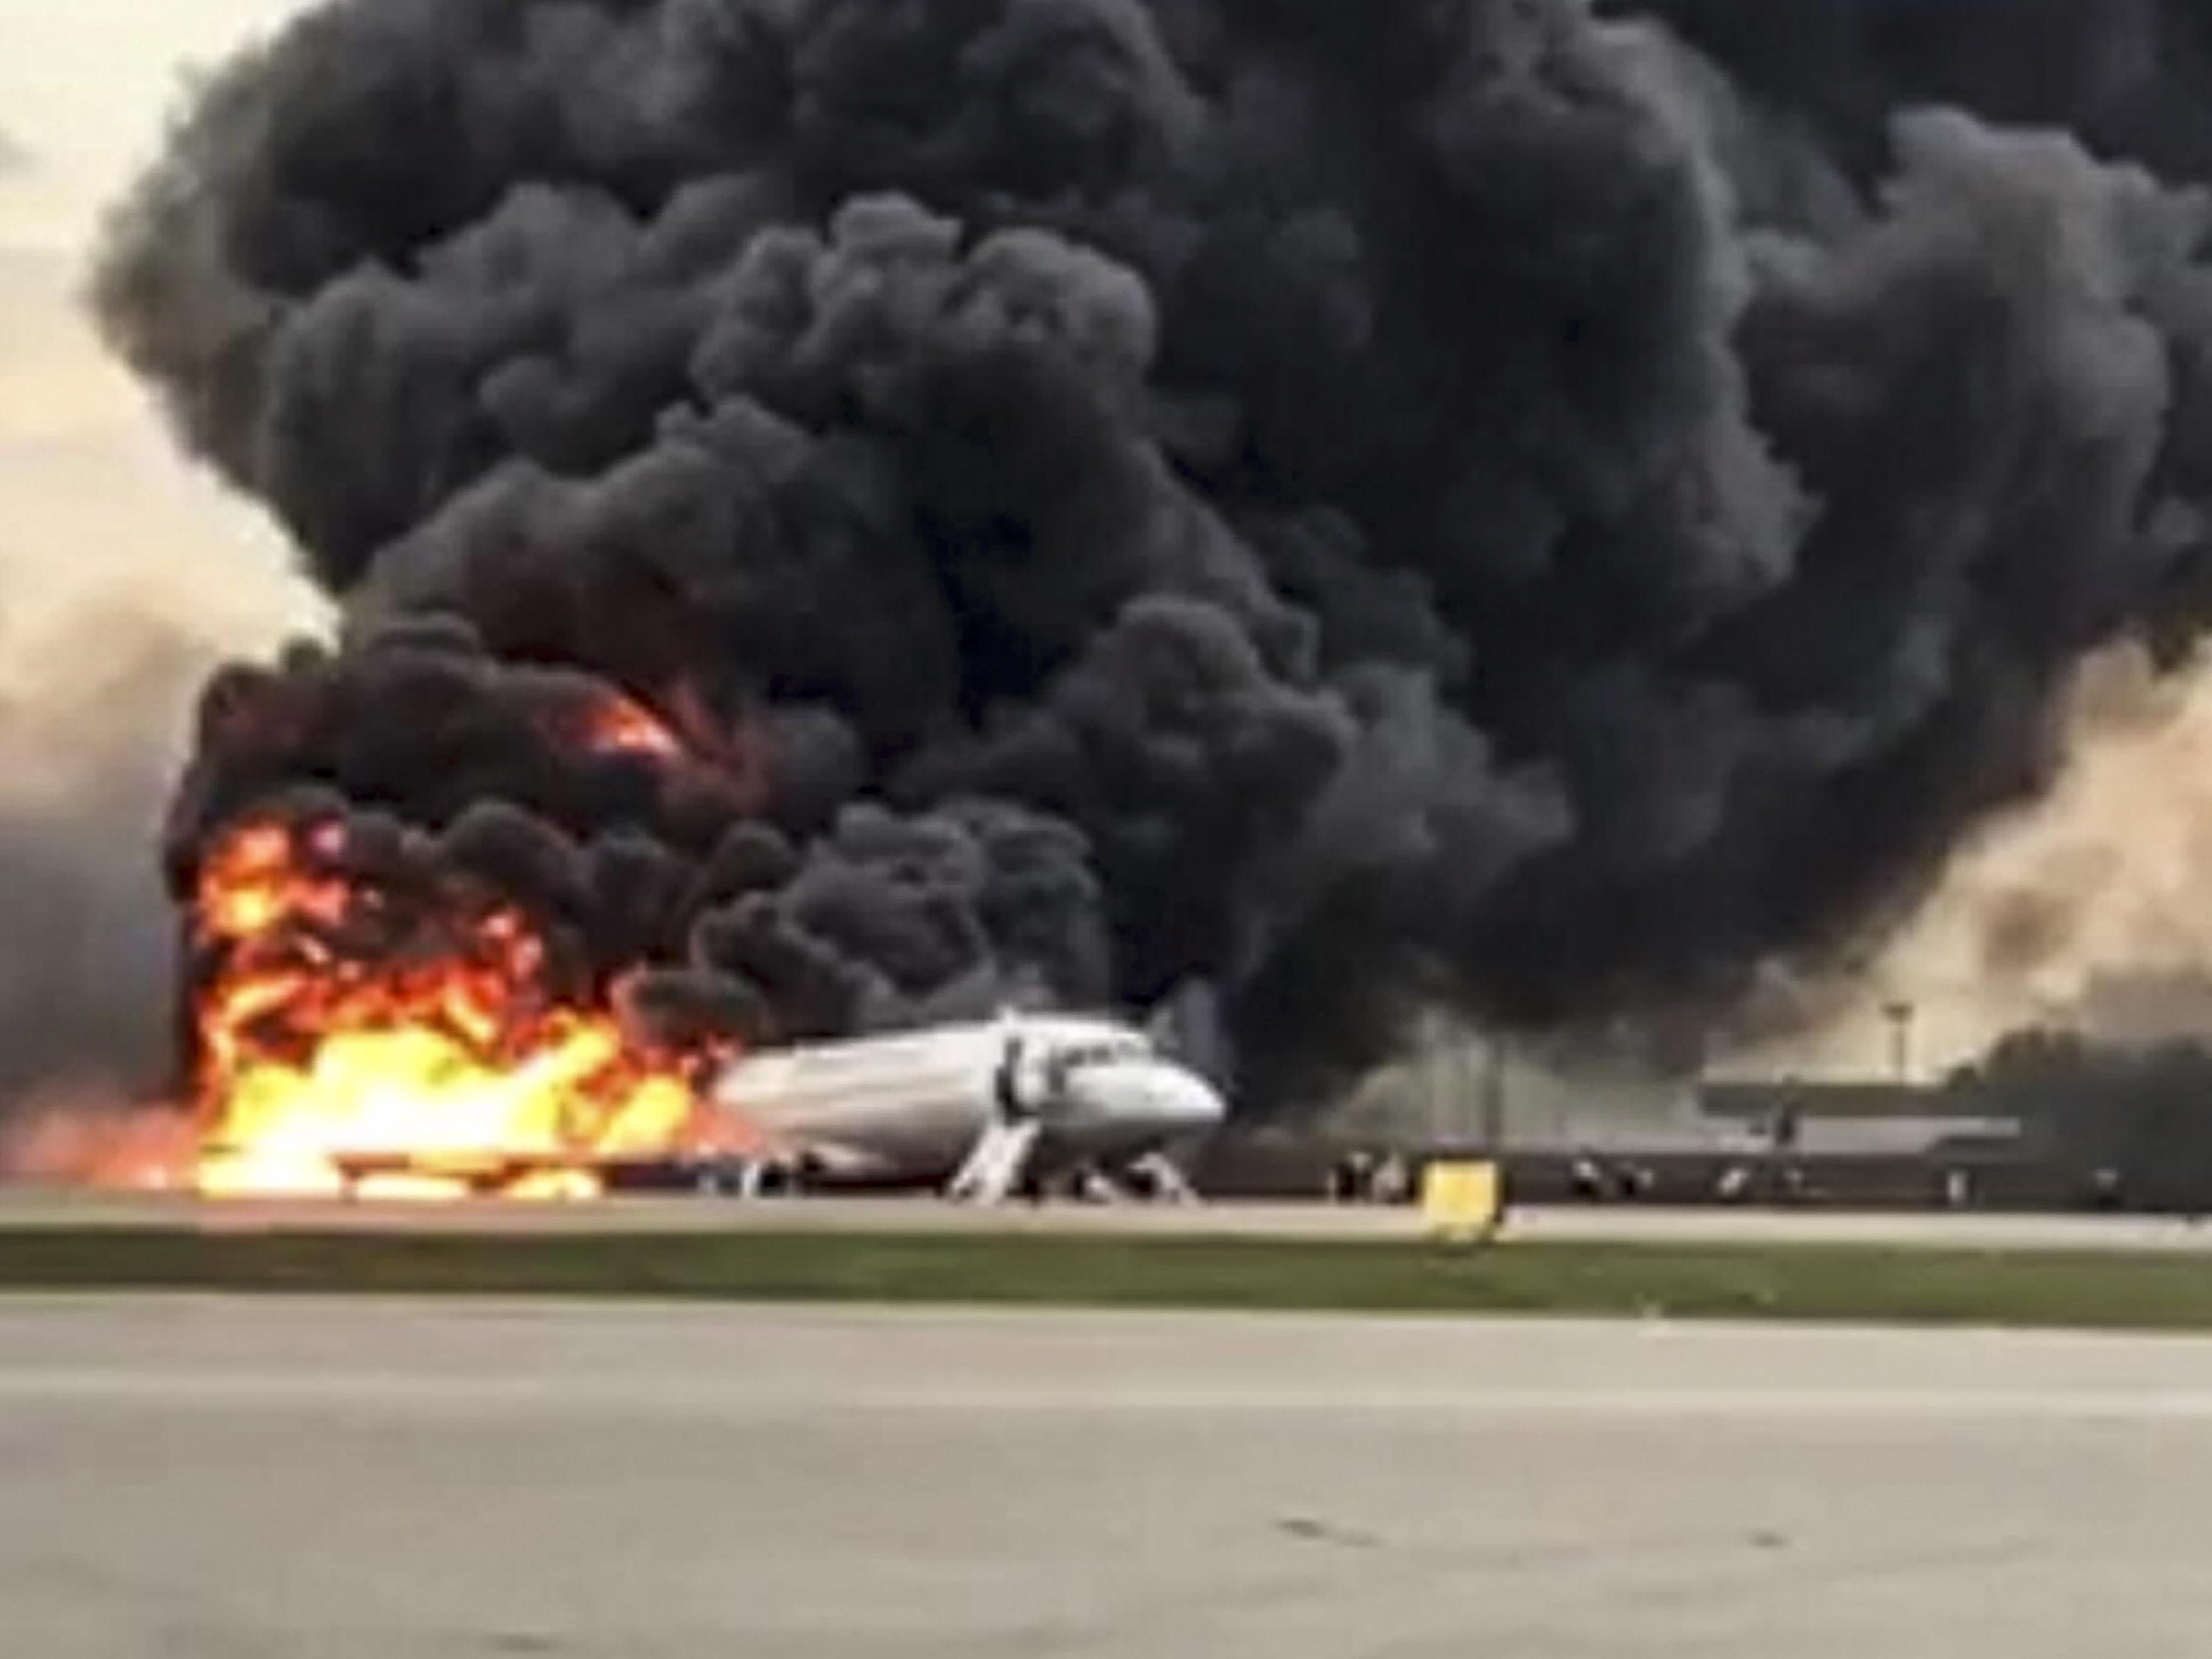 Fiery Crash Landing Of Russian Passenger Plane In Moscow Leaves 41 Dead